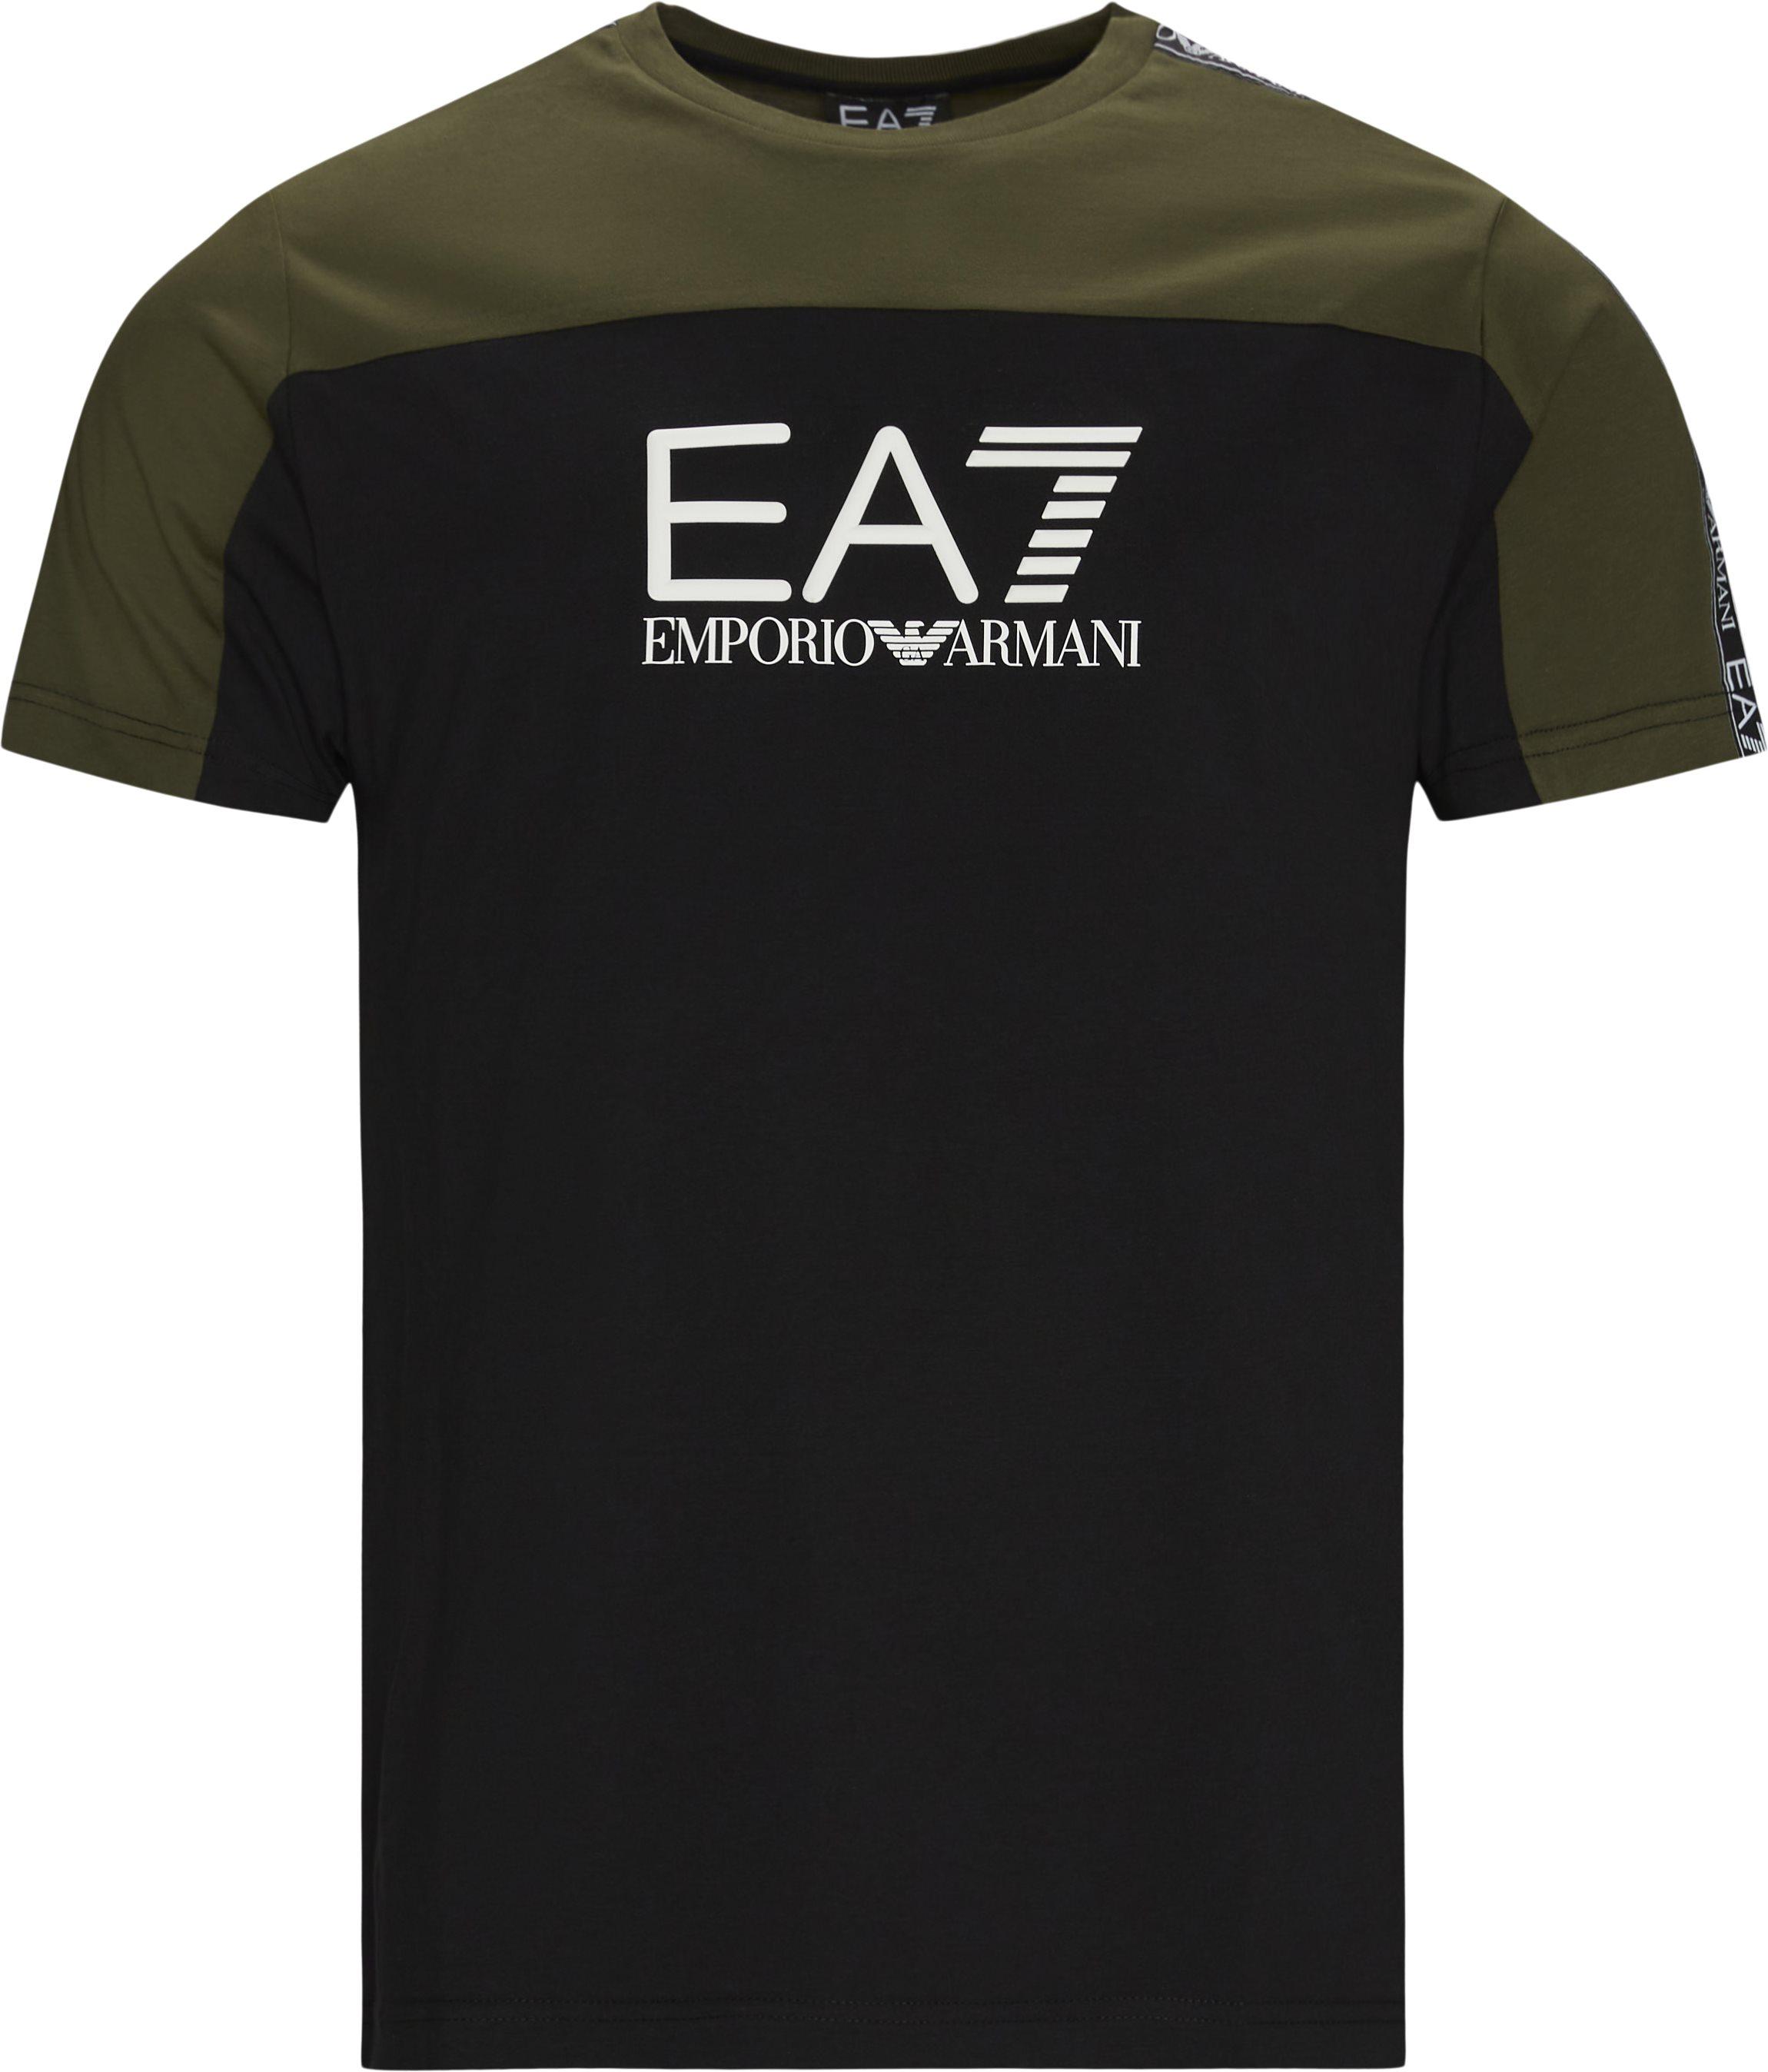 PJ7CZ Logo T-shirt - T-shirts - Regular fit - Sort